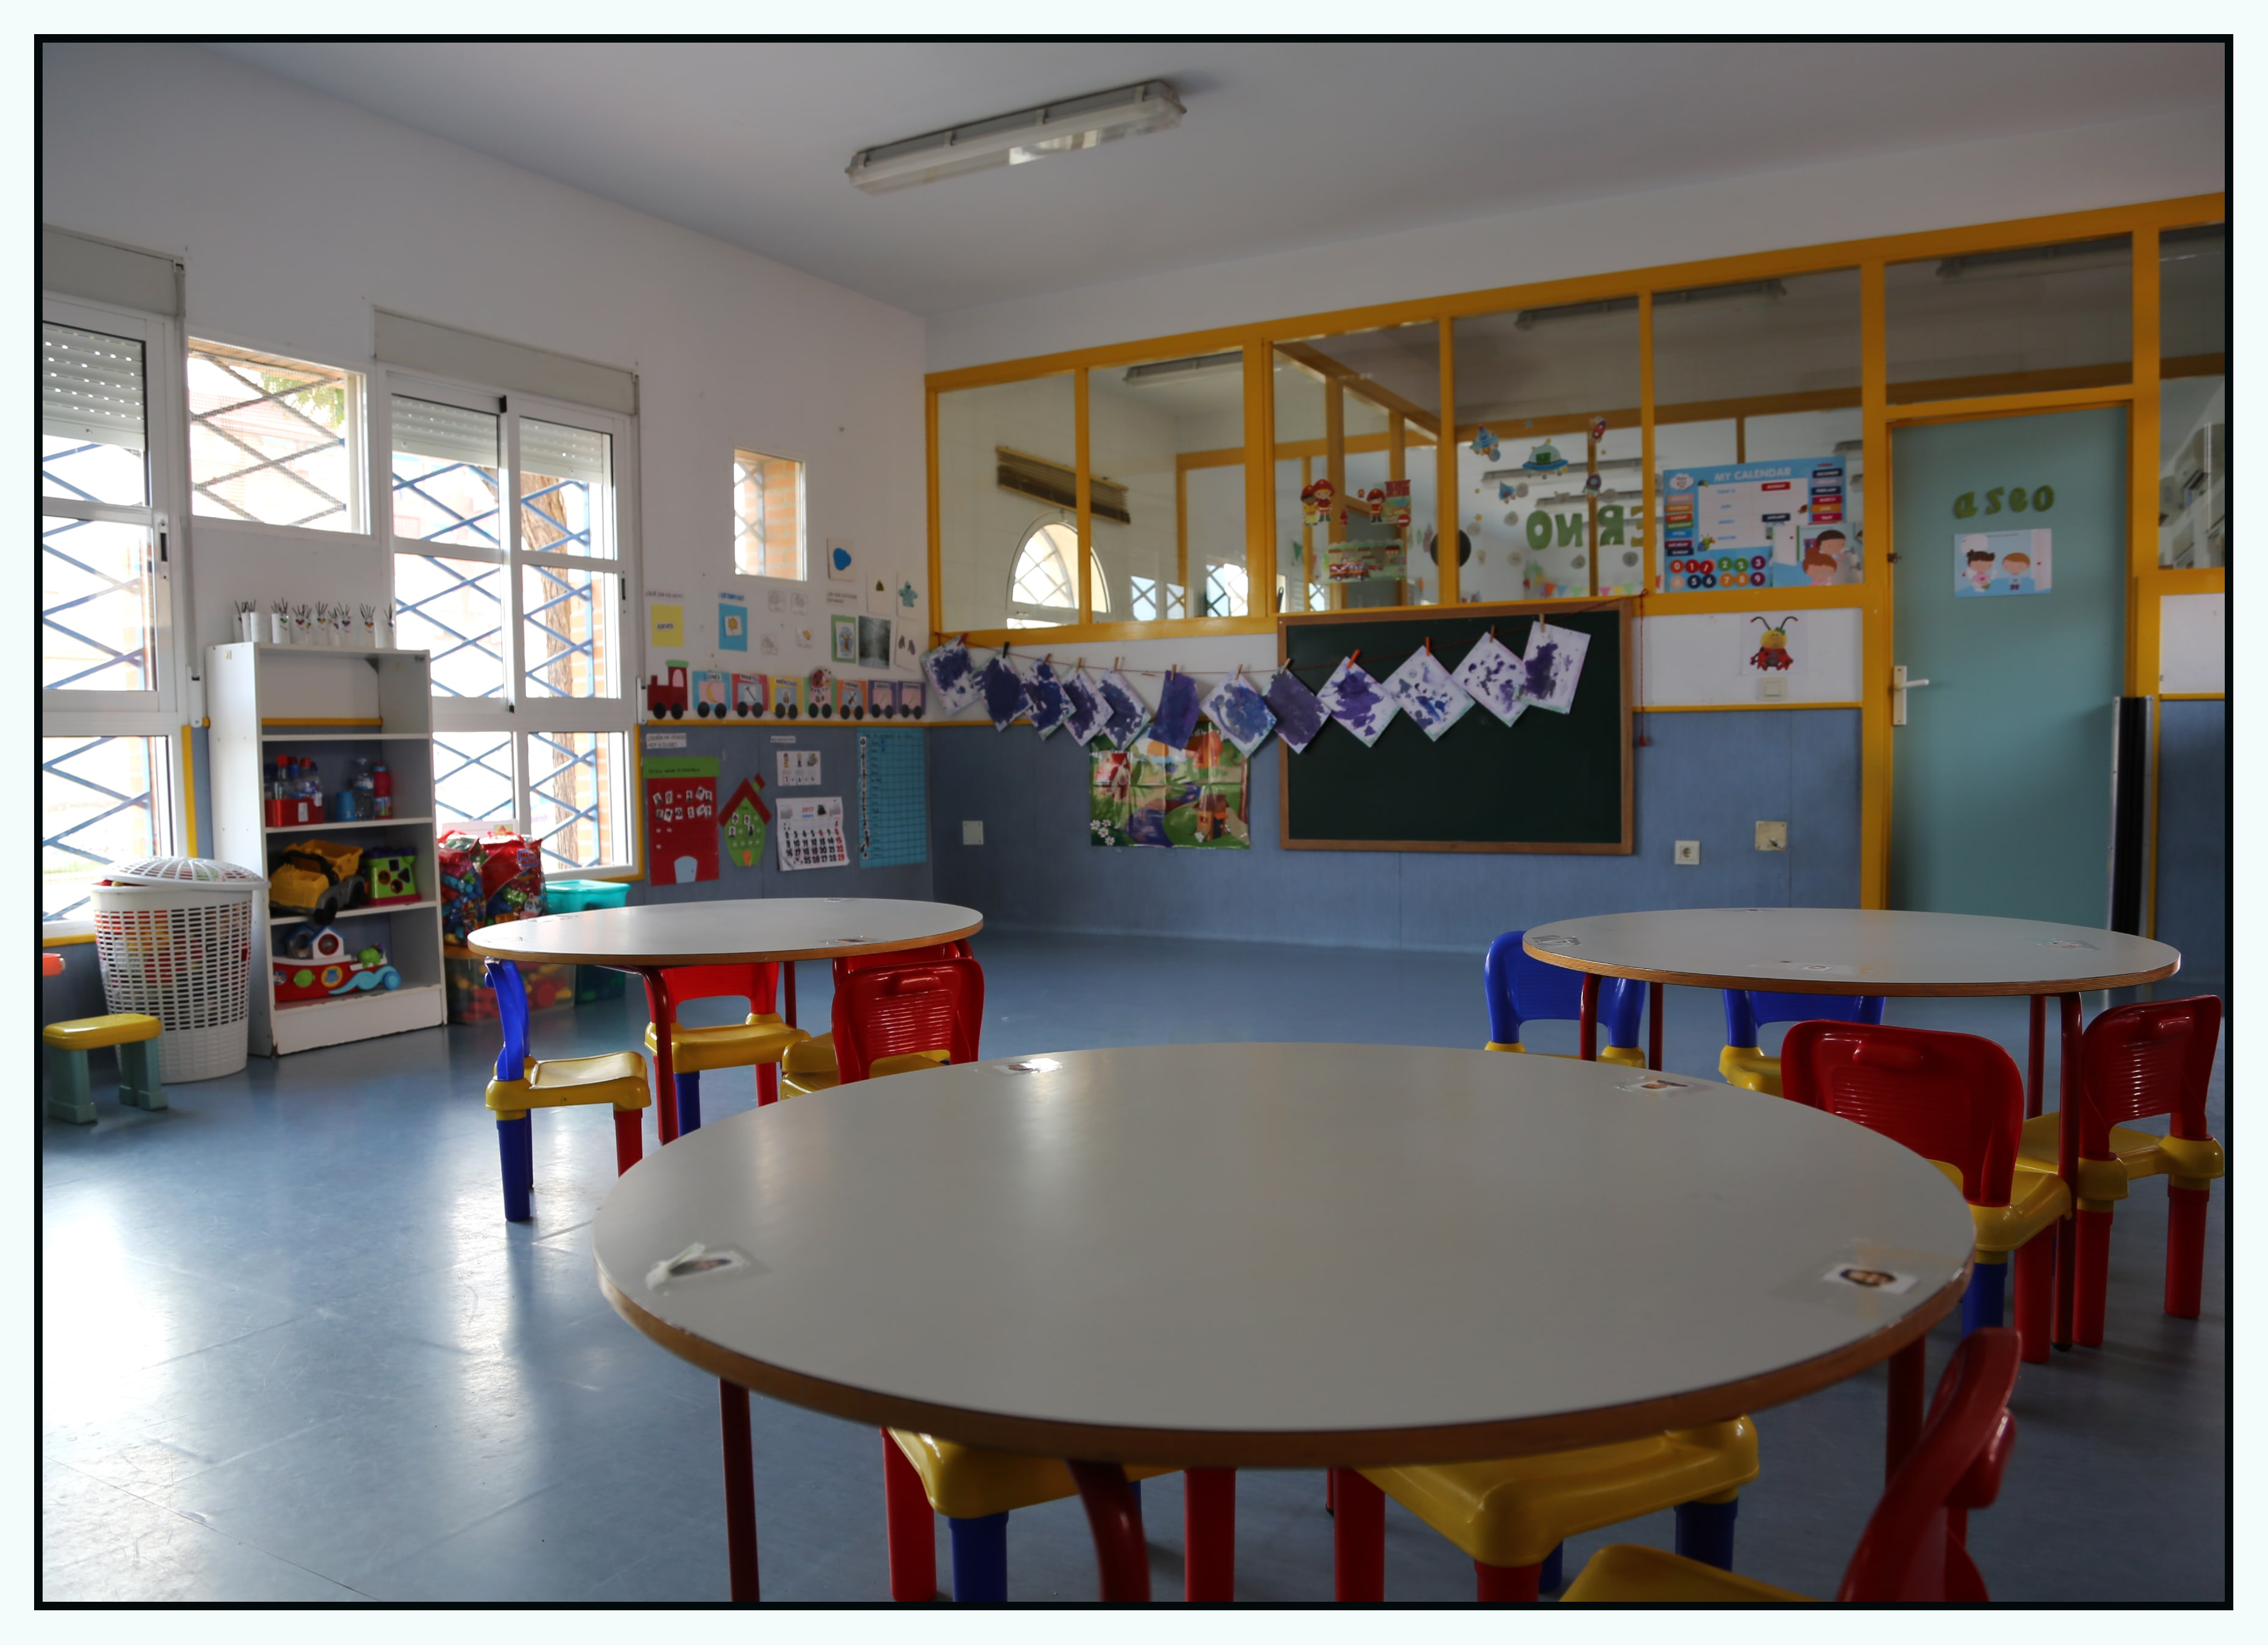 aula2-min